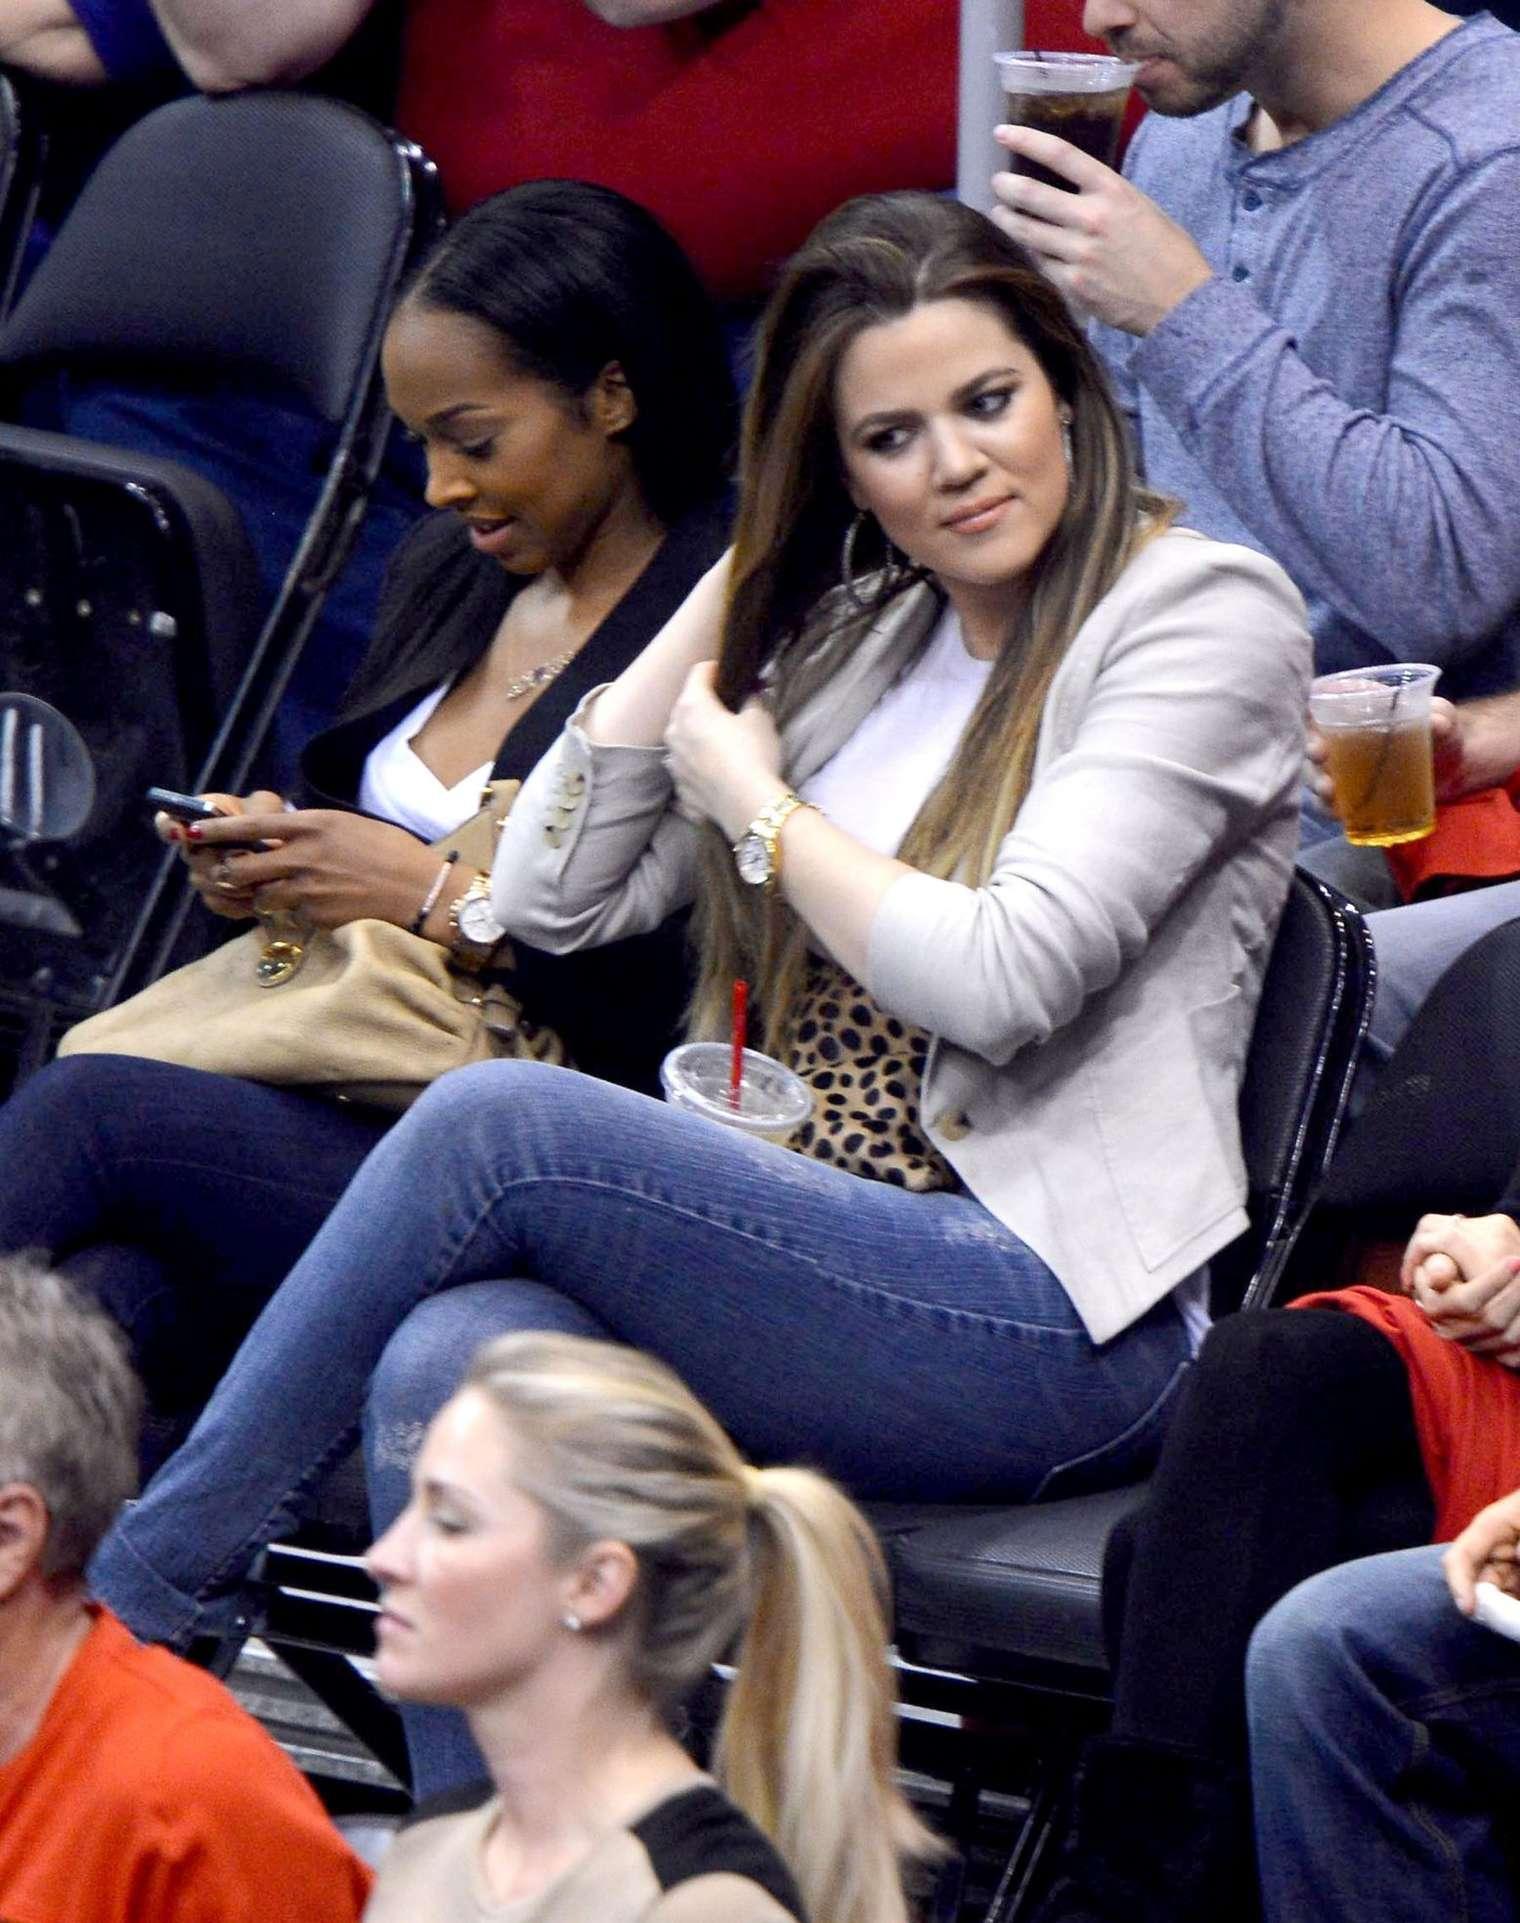 Khloe Kardashian 2013 : Khloe Kardashian at the LA Clippers game -01